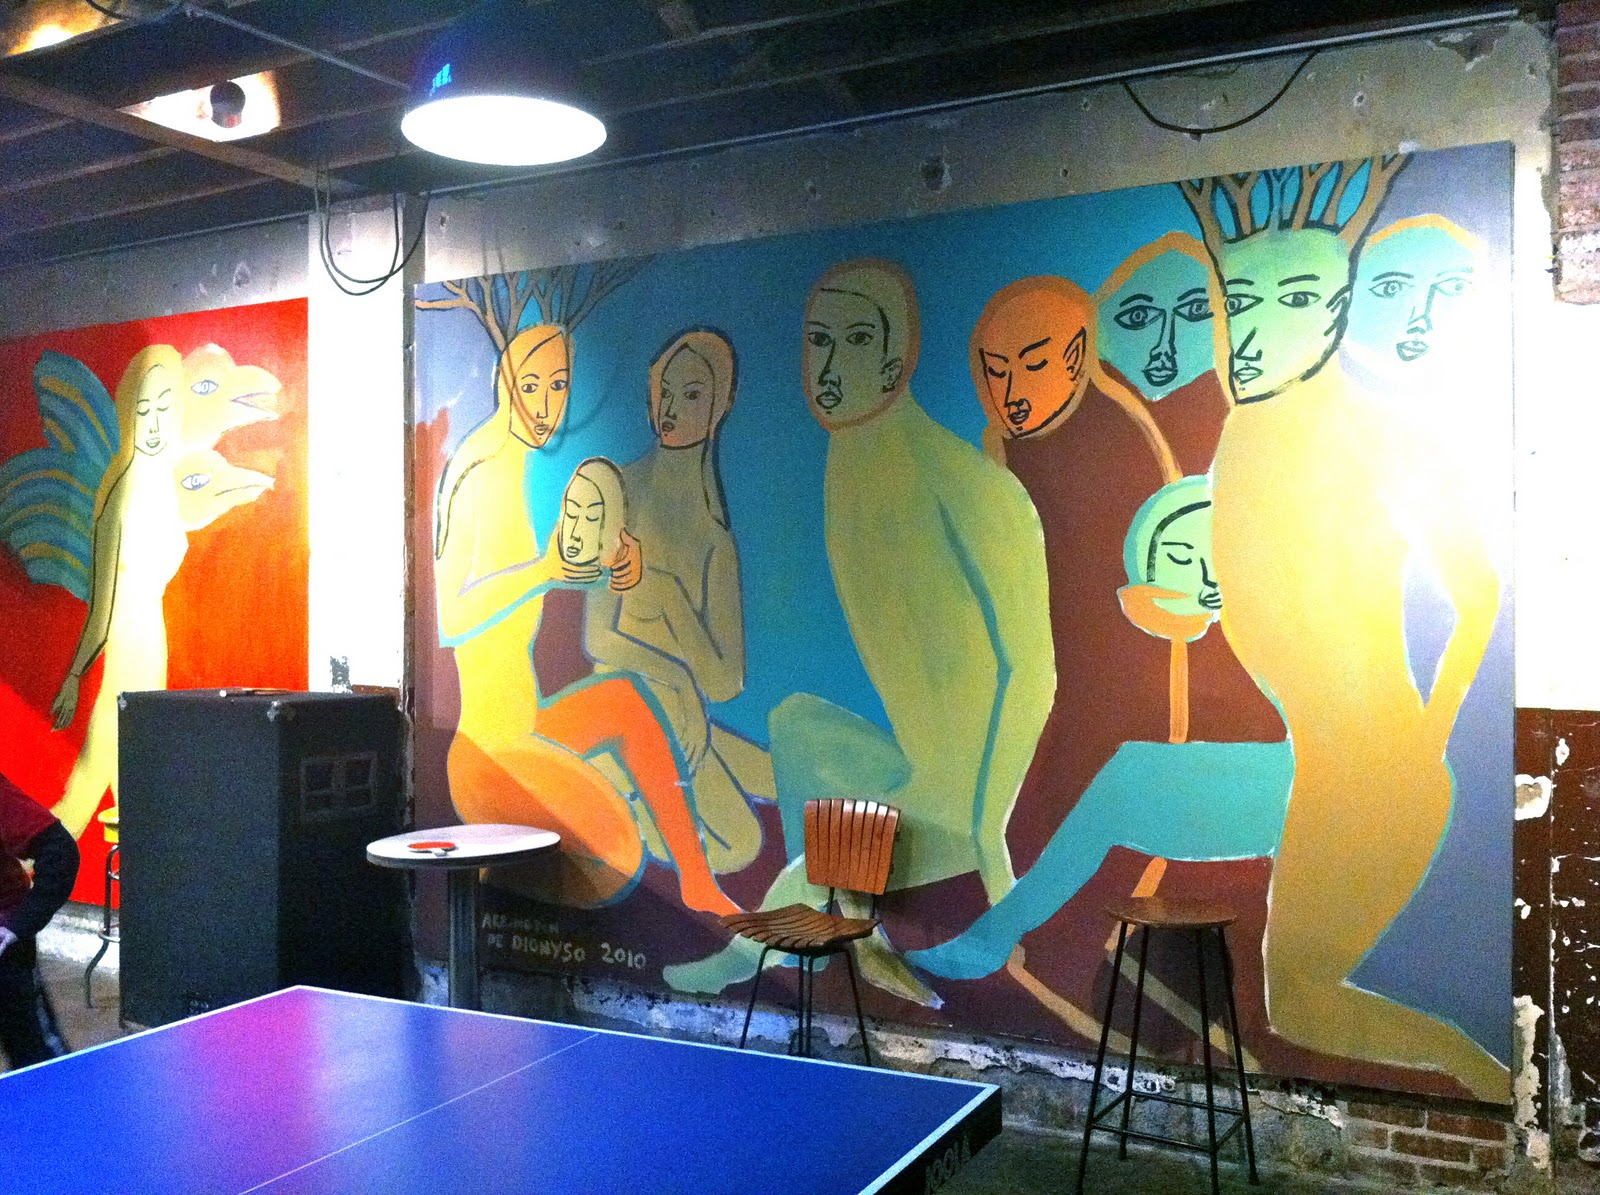 Comet Ping Pong Design Or Dye